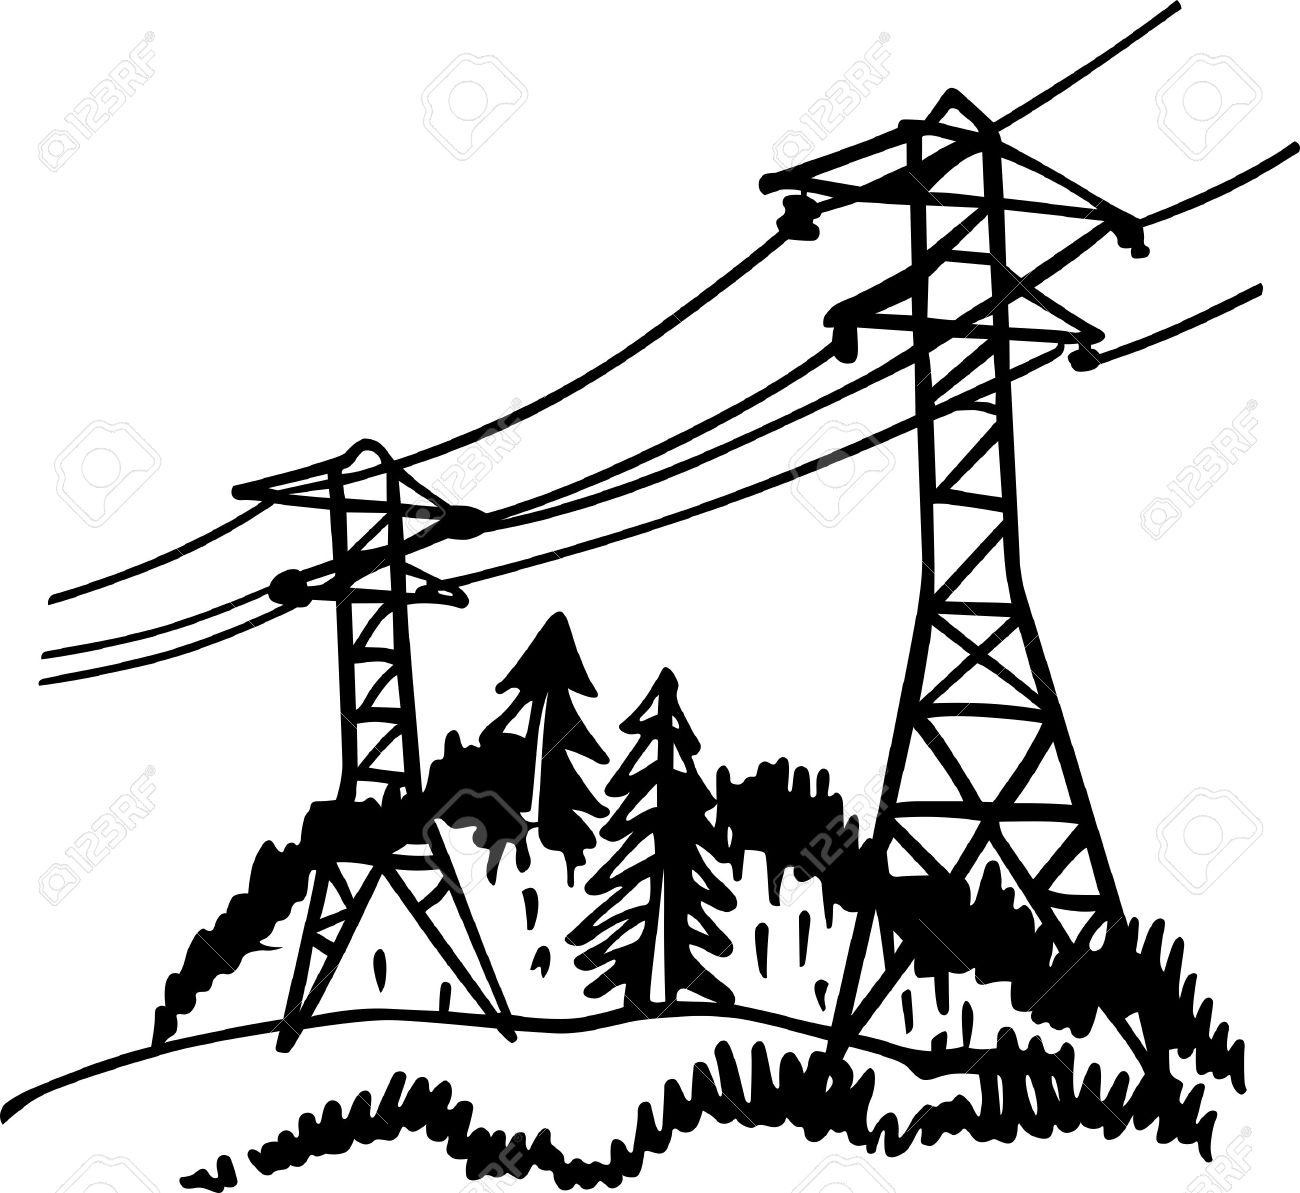 1300x1193 Power Line Clipart High Voltage